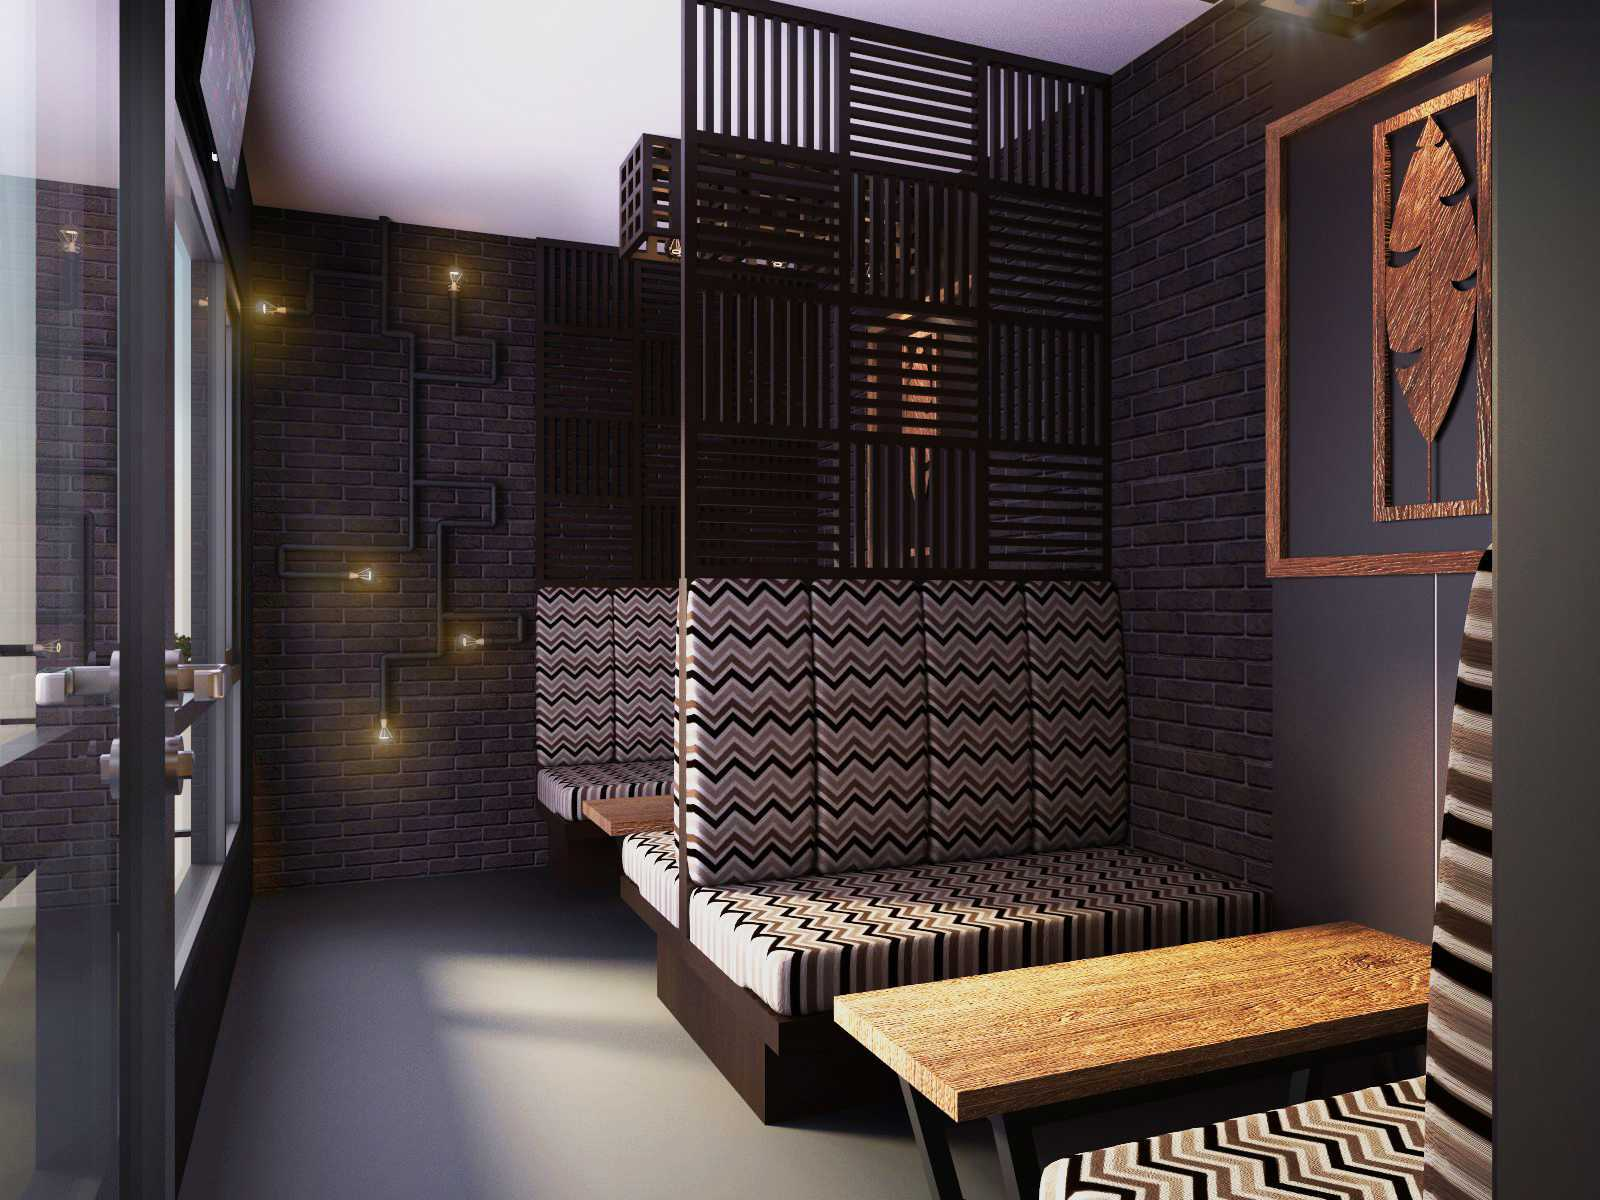 Mbartliving Canteen Lounge Tj. Duren Utara, Kec. Grogol Petamburan, Kota Jakarta Barat, Daerah Khusus Ibukota Jakarta, Indonesia Tj. Duren Utara, Kec. Grogol Petamburan, Kota Jakarta Barat, Daerah Khusus Ibukota Jakarta, Indonesia Mbartliving-Canteen-Lounge  74546